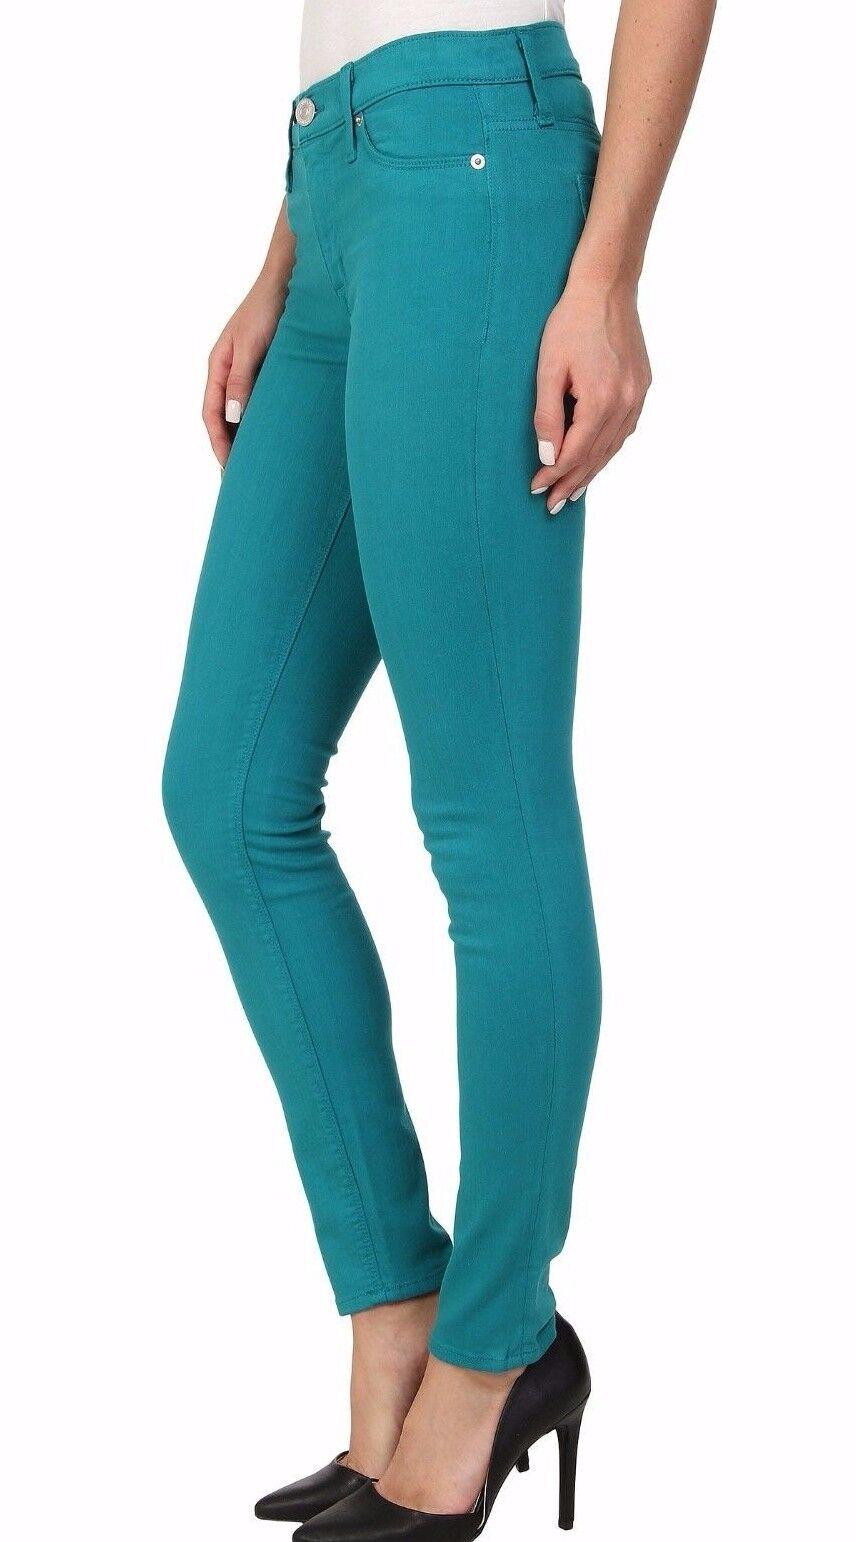 Nwt Hudson Sz30 Collin Midrise Super Skinny Stretch Jeans In